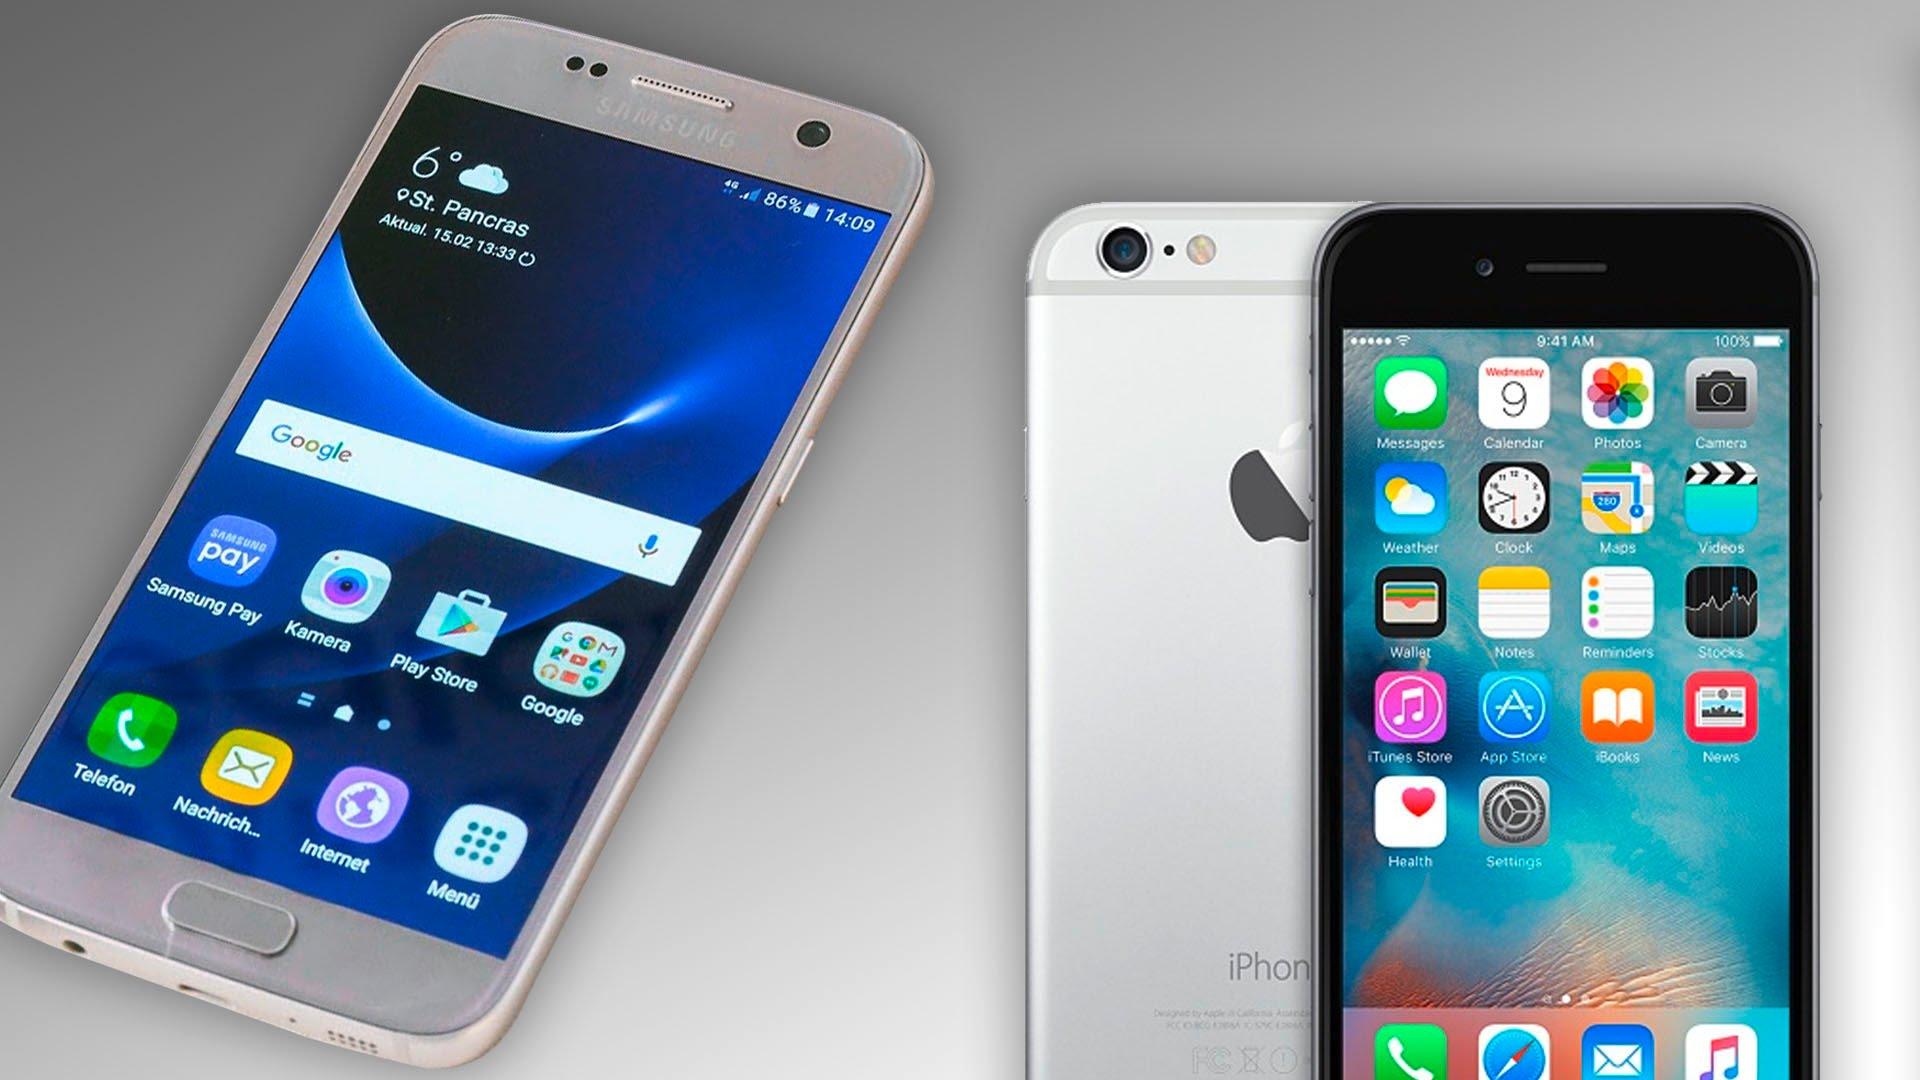 Iphone se vs galaxy s7 camera